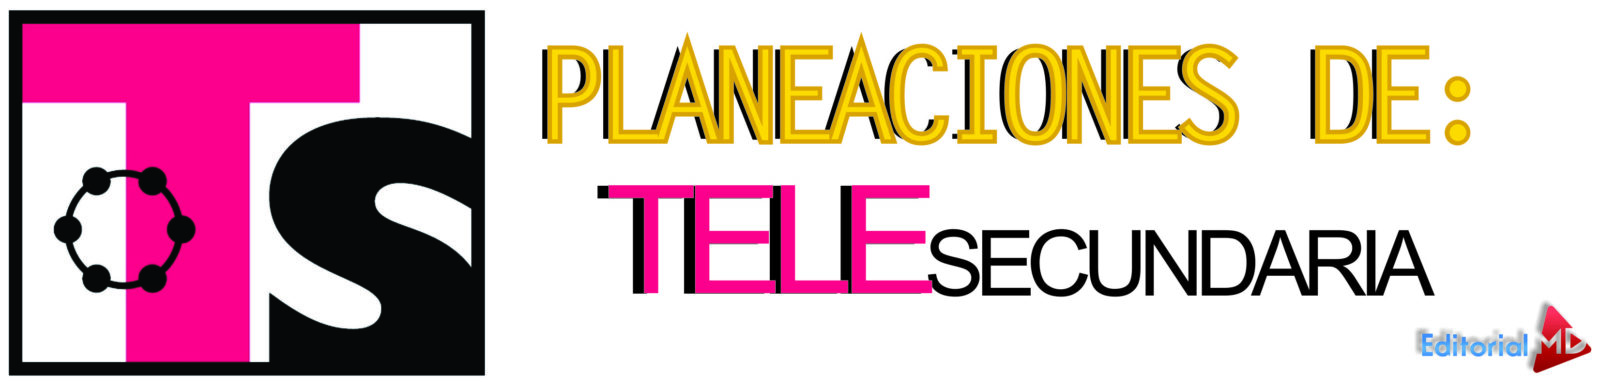 Planeaciones de telesecundaria 2020-021